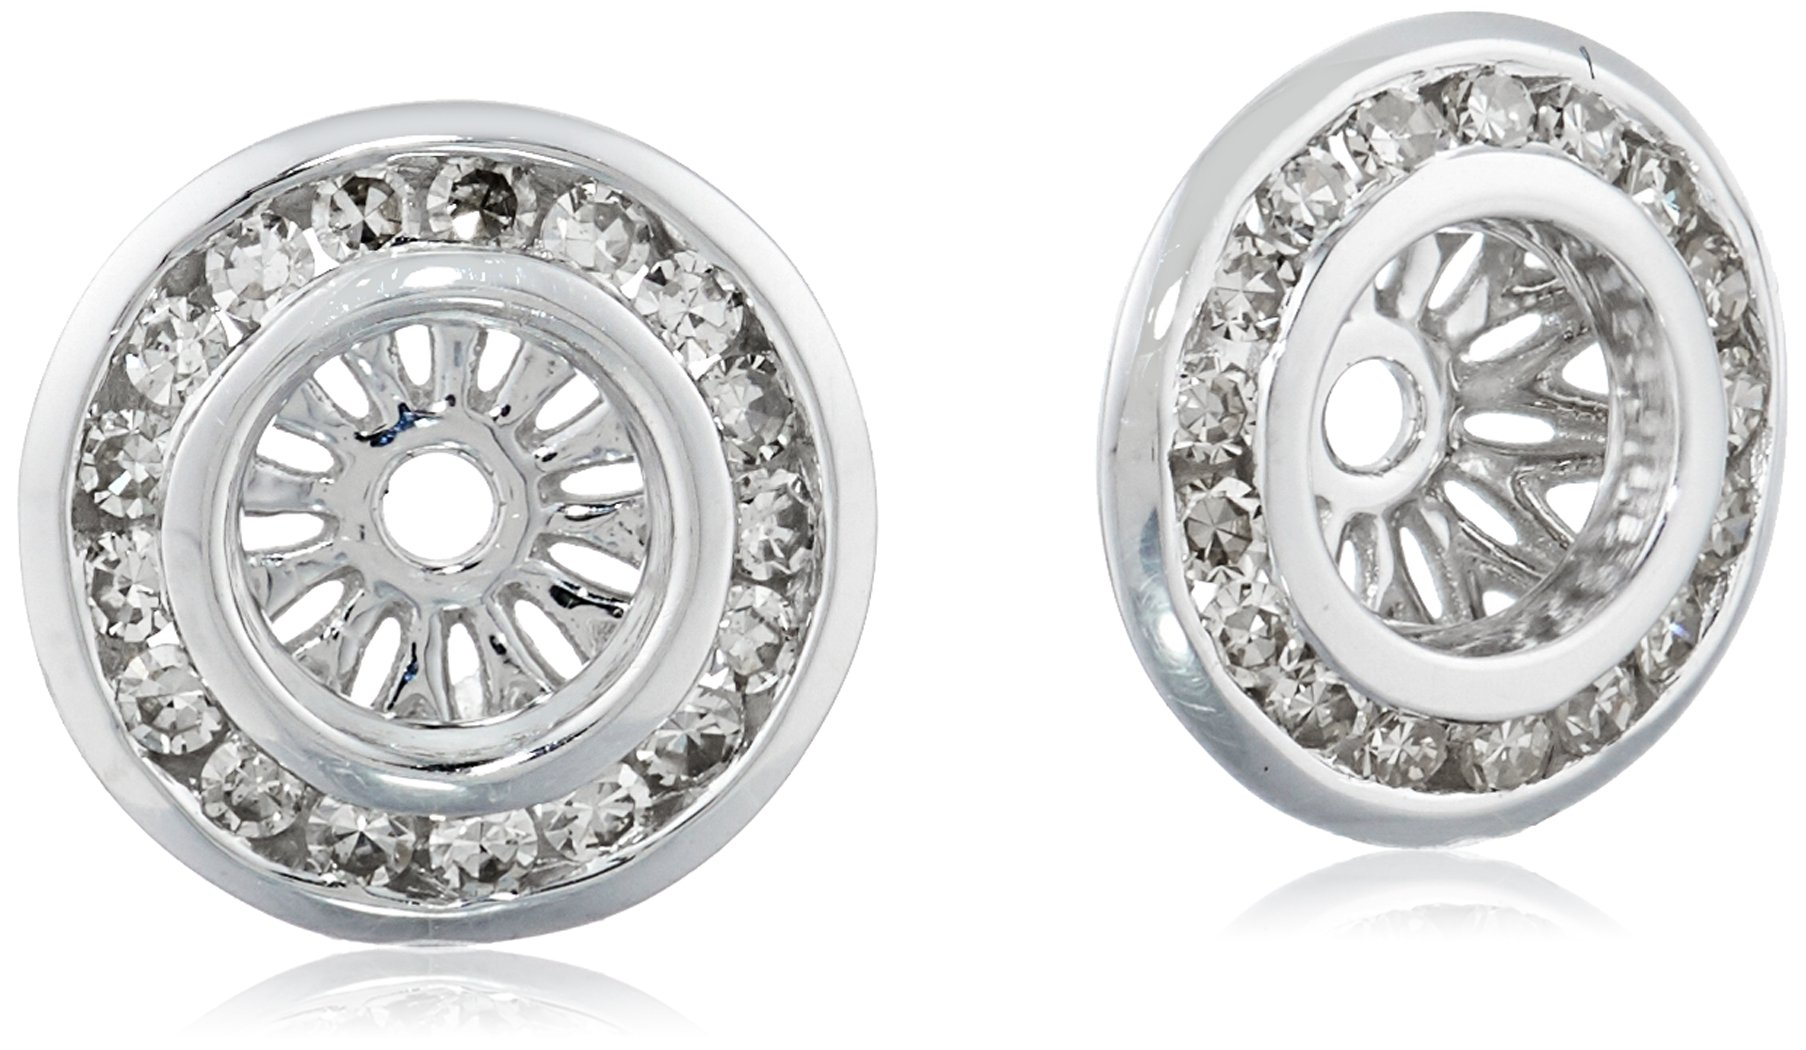 14k White Gold Diamond Channel Halo Earrings Jackets (1/4 cttw, J-K Color, I2-I3 Clarity)